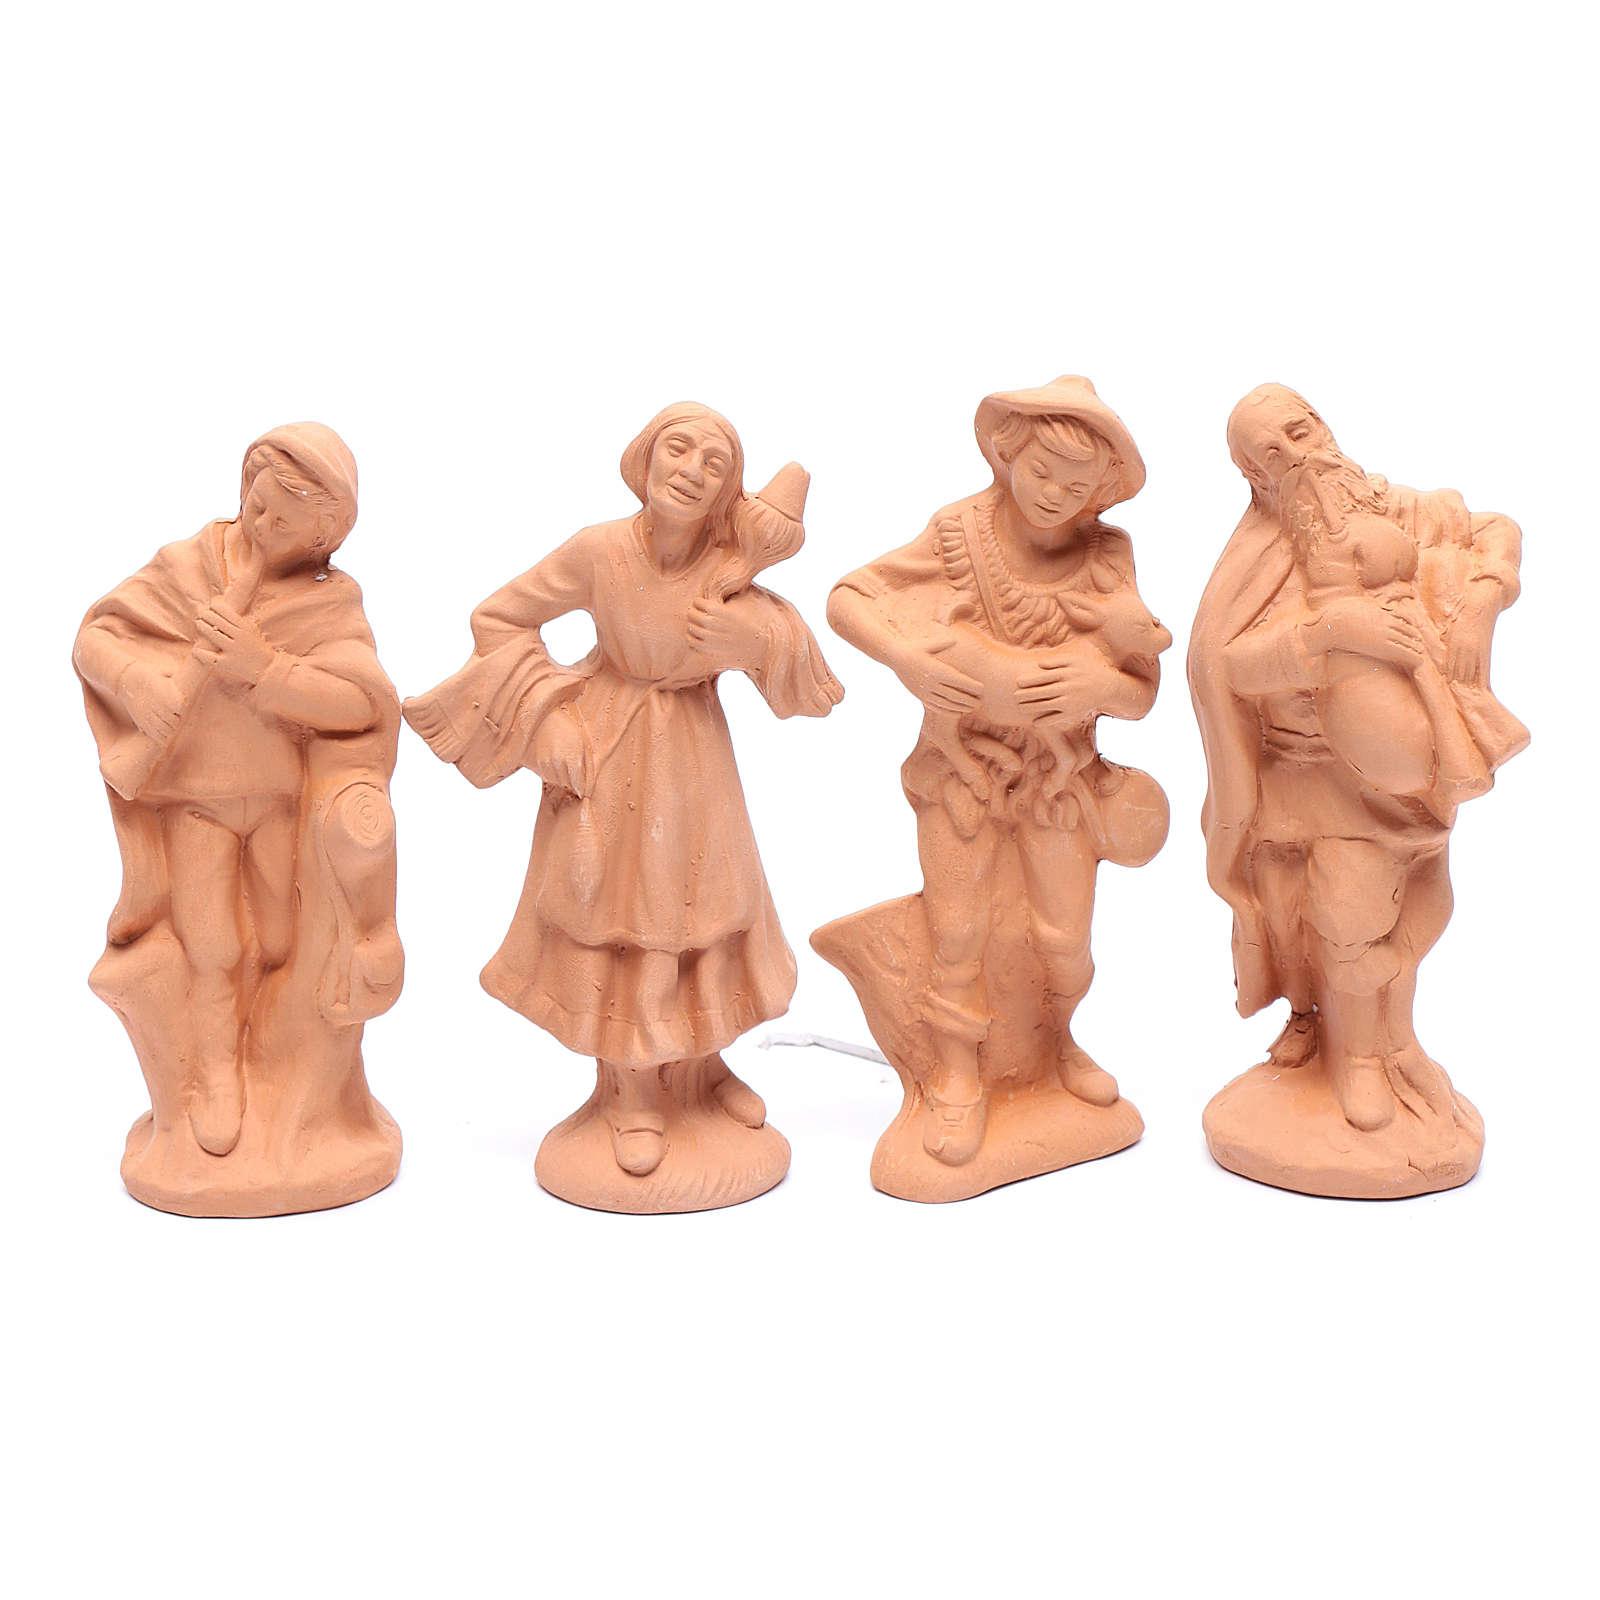 Presepe terracotta naturale 15 statuine 15 cm 4